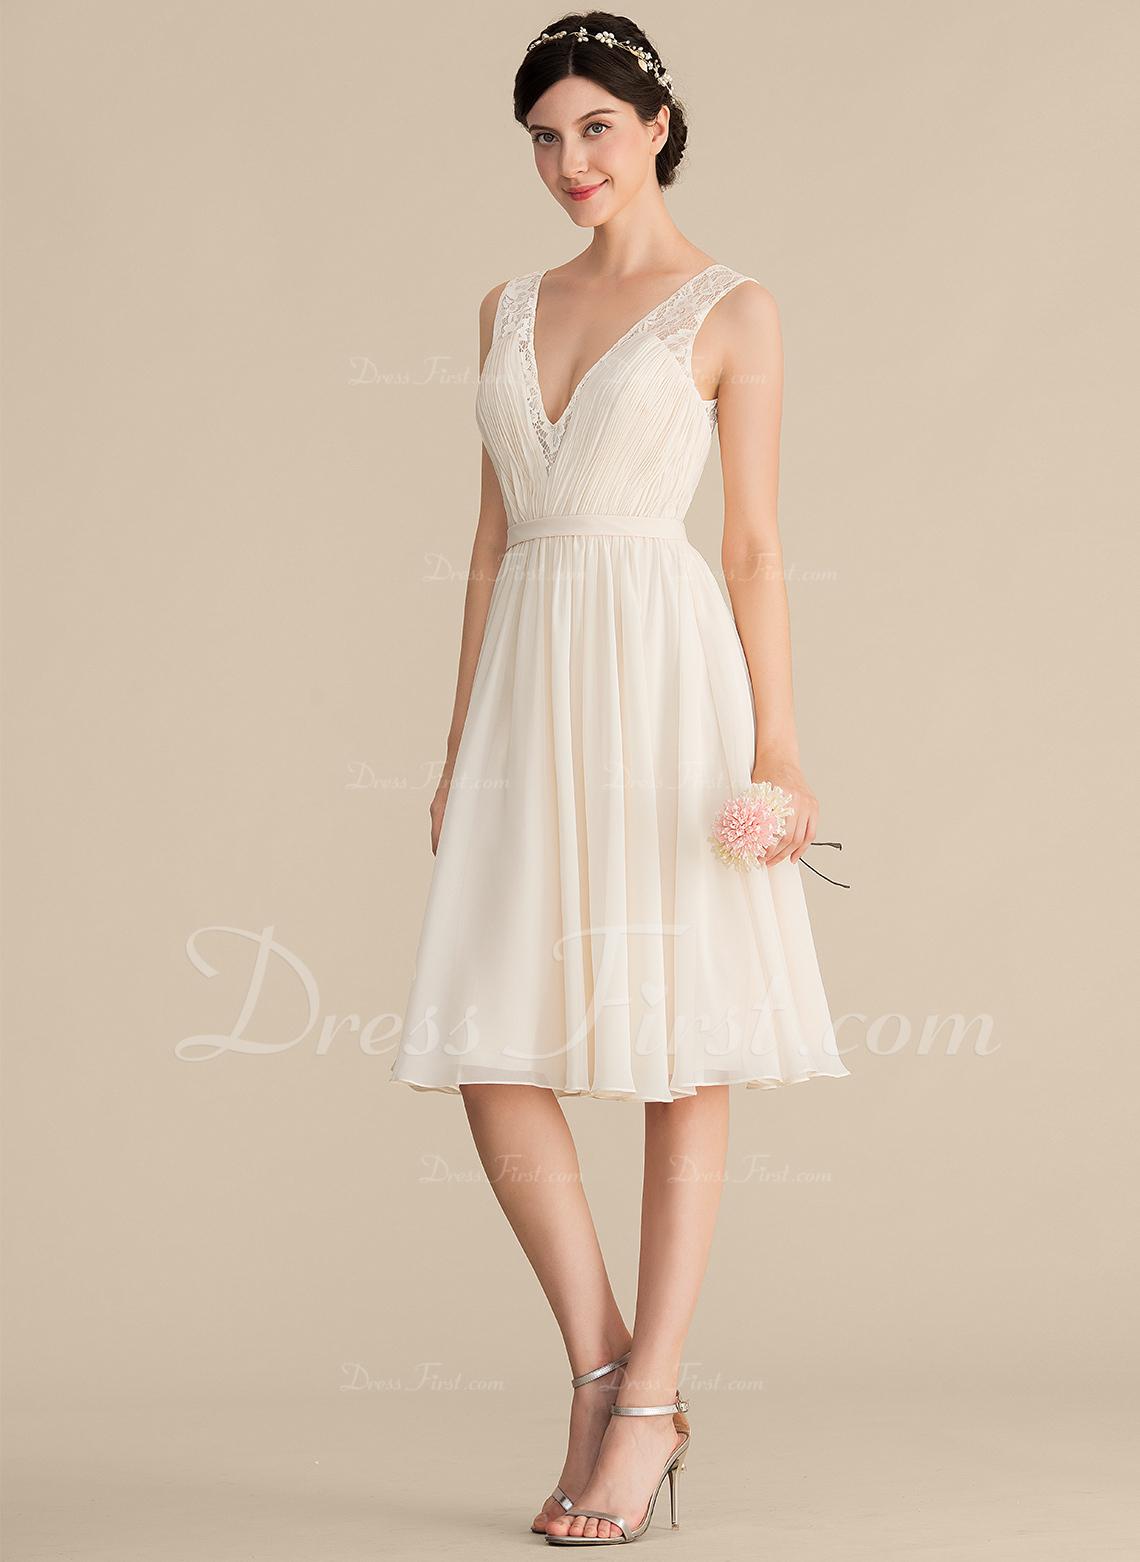 1e94f92883b7e Loading zoom. Loading. Color: As Picture. A-Line/Princess V-neck Knee-Length  Chiffon Lace Bridesmaid Dress ...